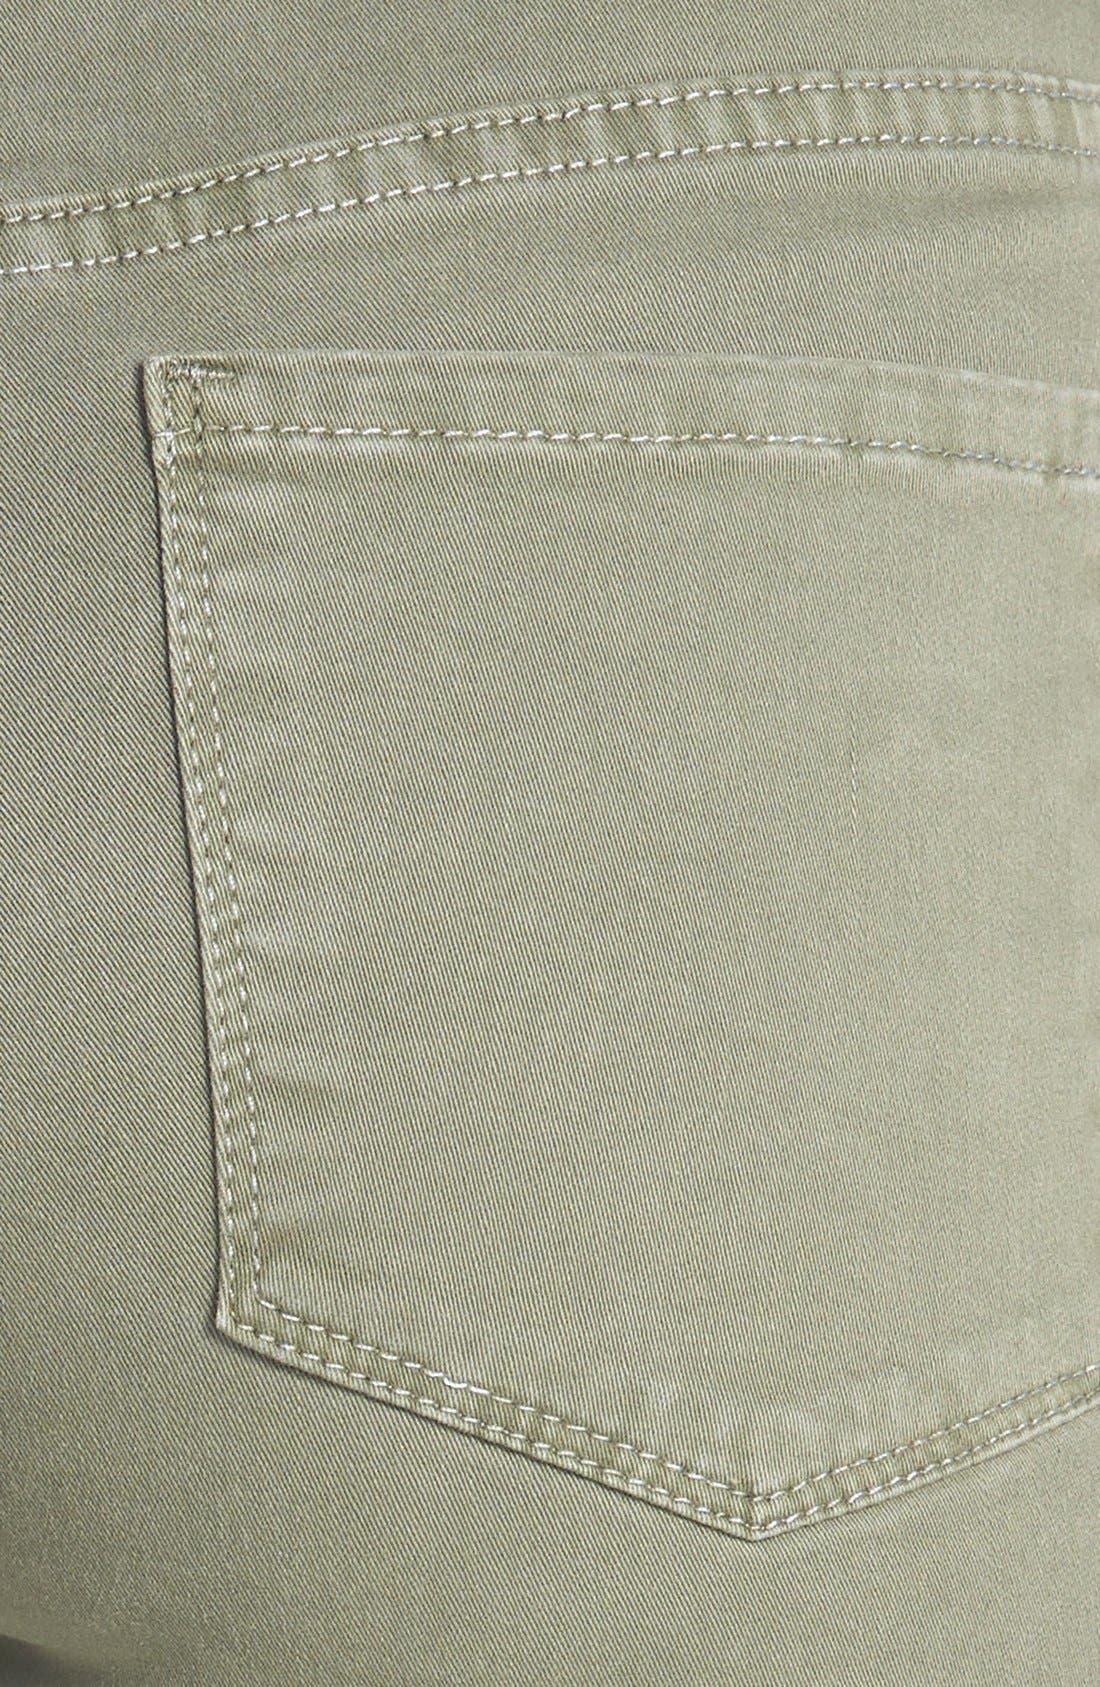 Alternate Image 3  - NYDJ 'Bobbie' Stretch Boyfriend Jeans (Fennel) (Regular & Petite)